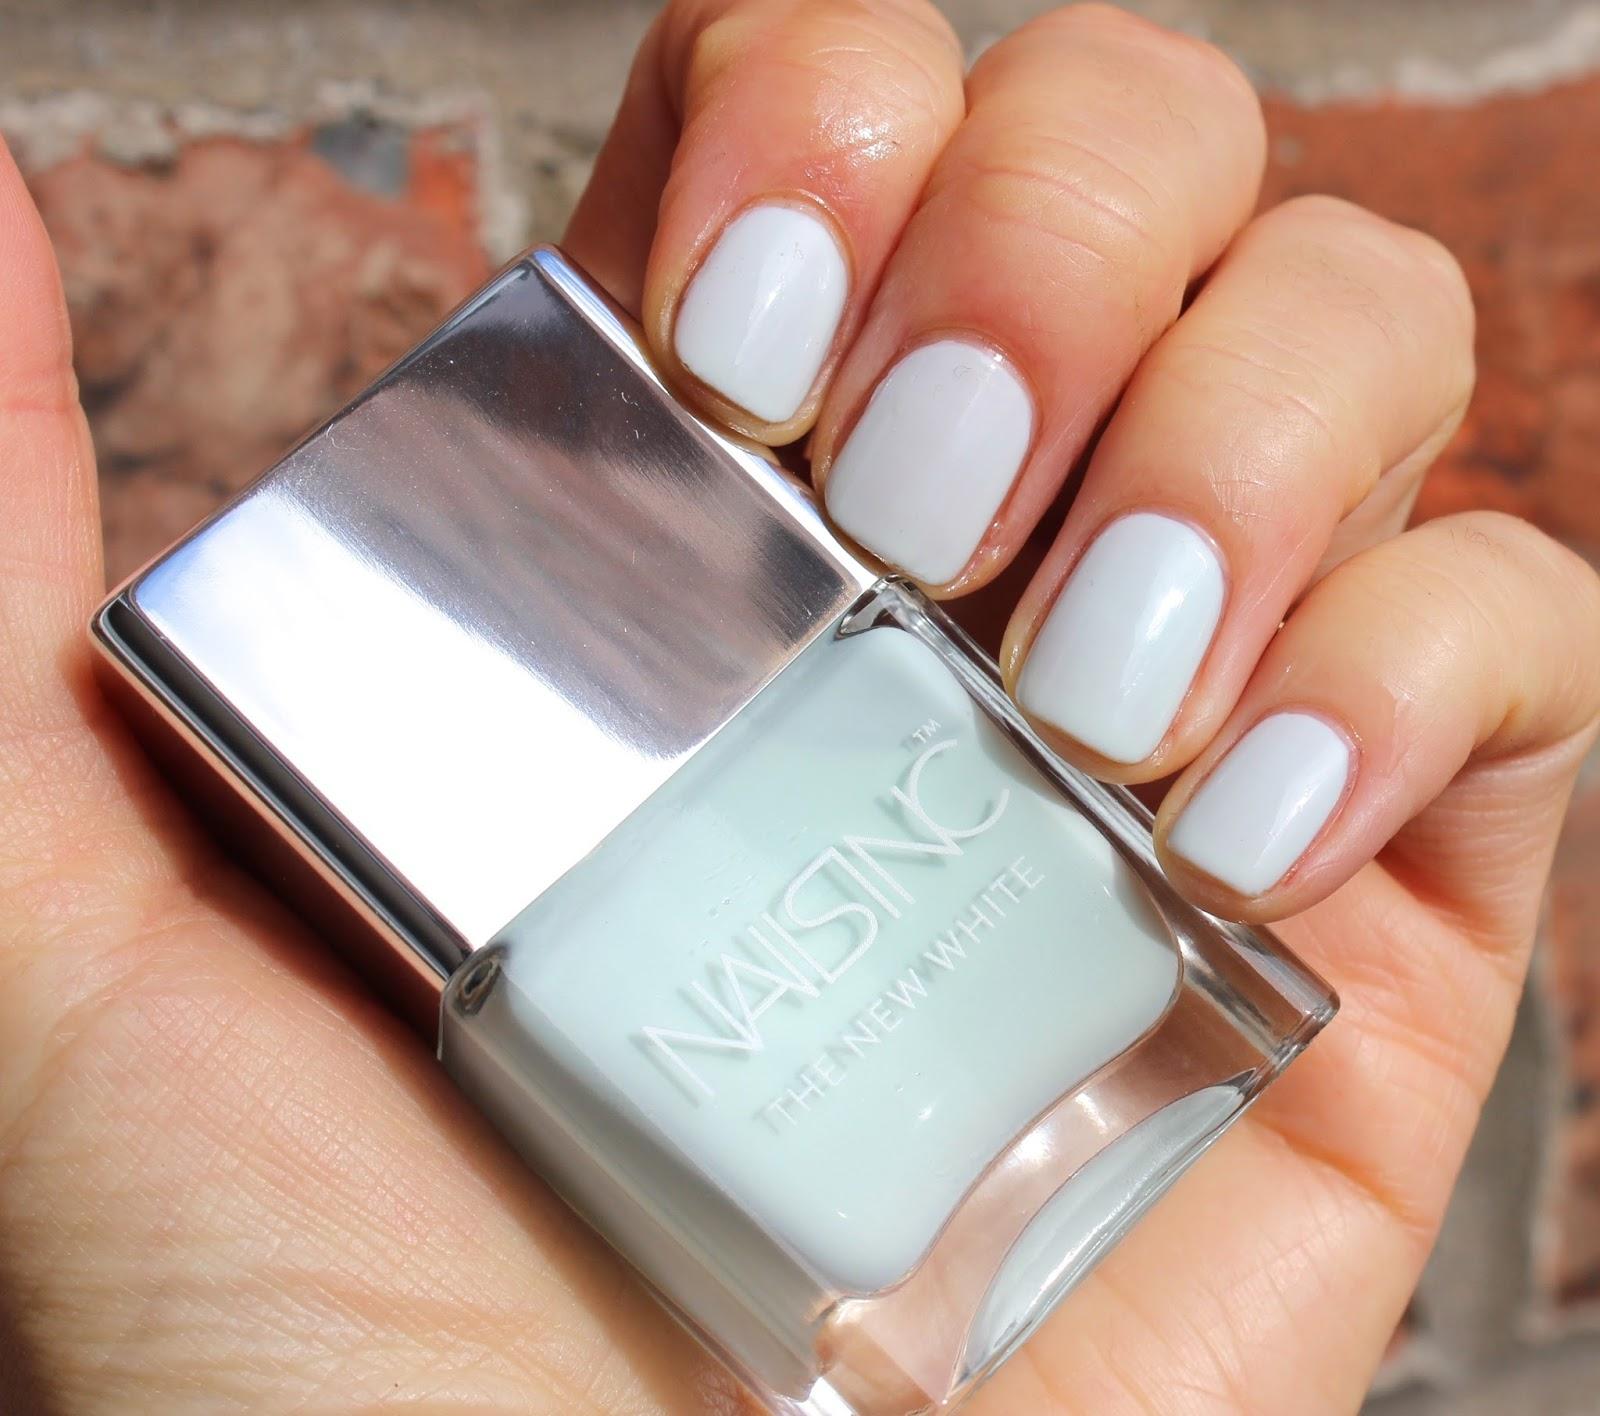 Fashion Beauty Inc: BEAUTY & LE CHIC: Best Of Beauty 2015